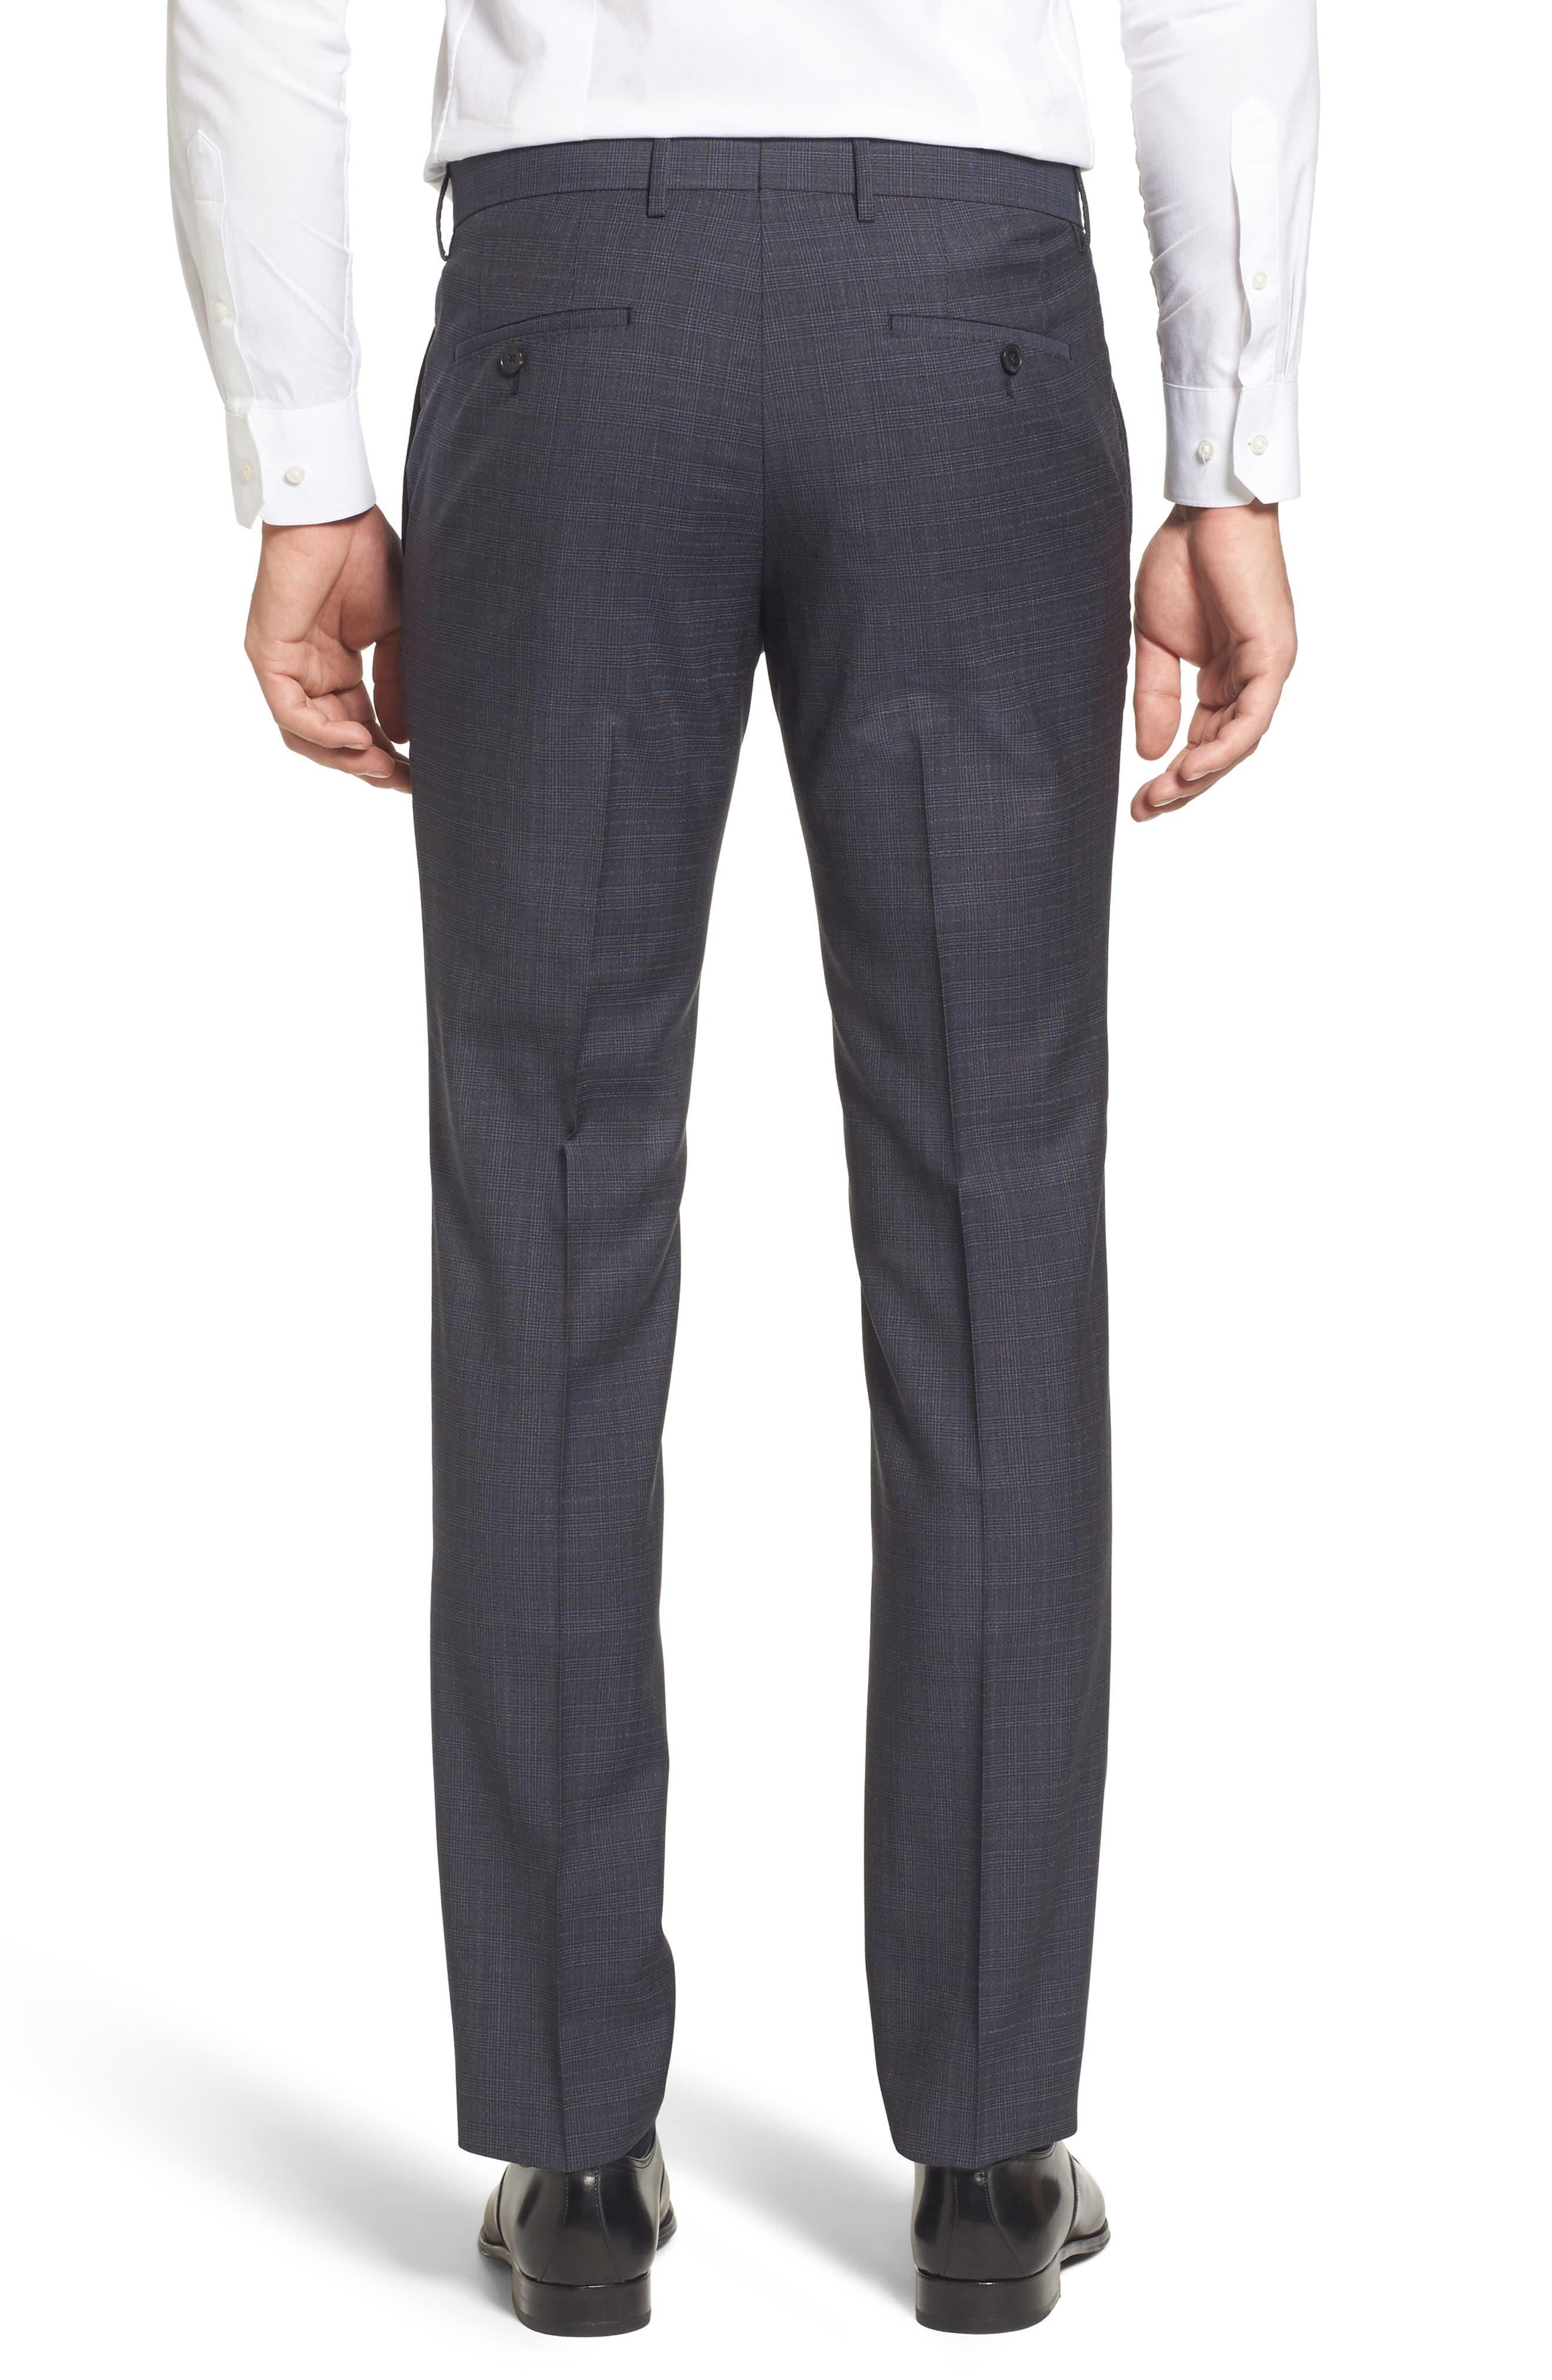 Benso Regular Fit Trousers,                             Alternate thumbnail 3, color,                             410